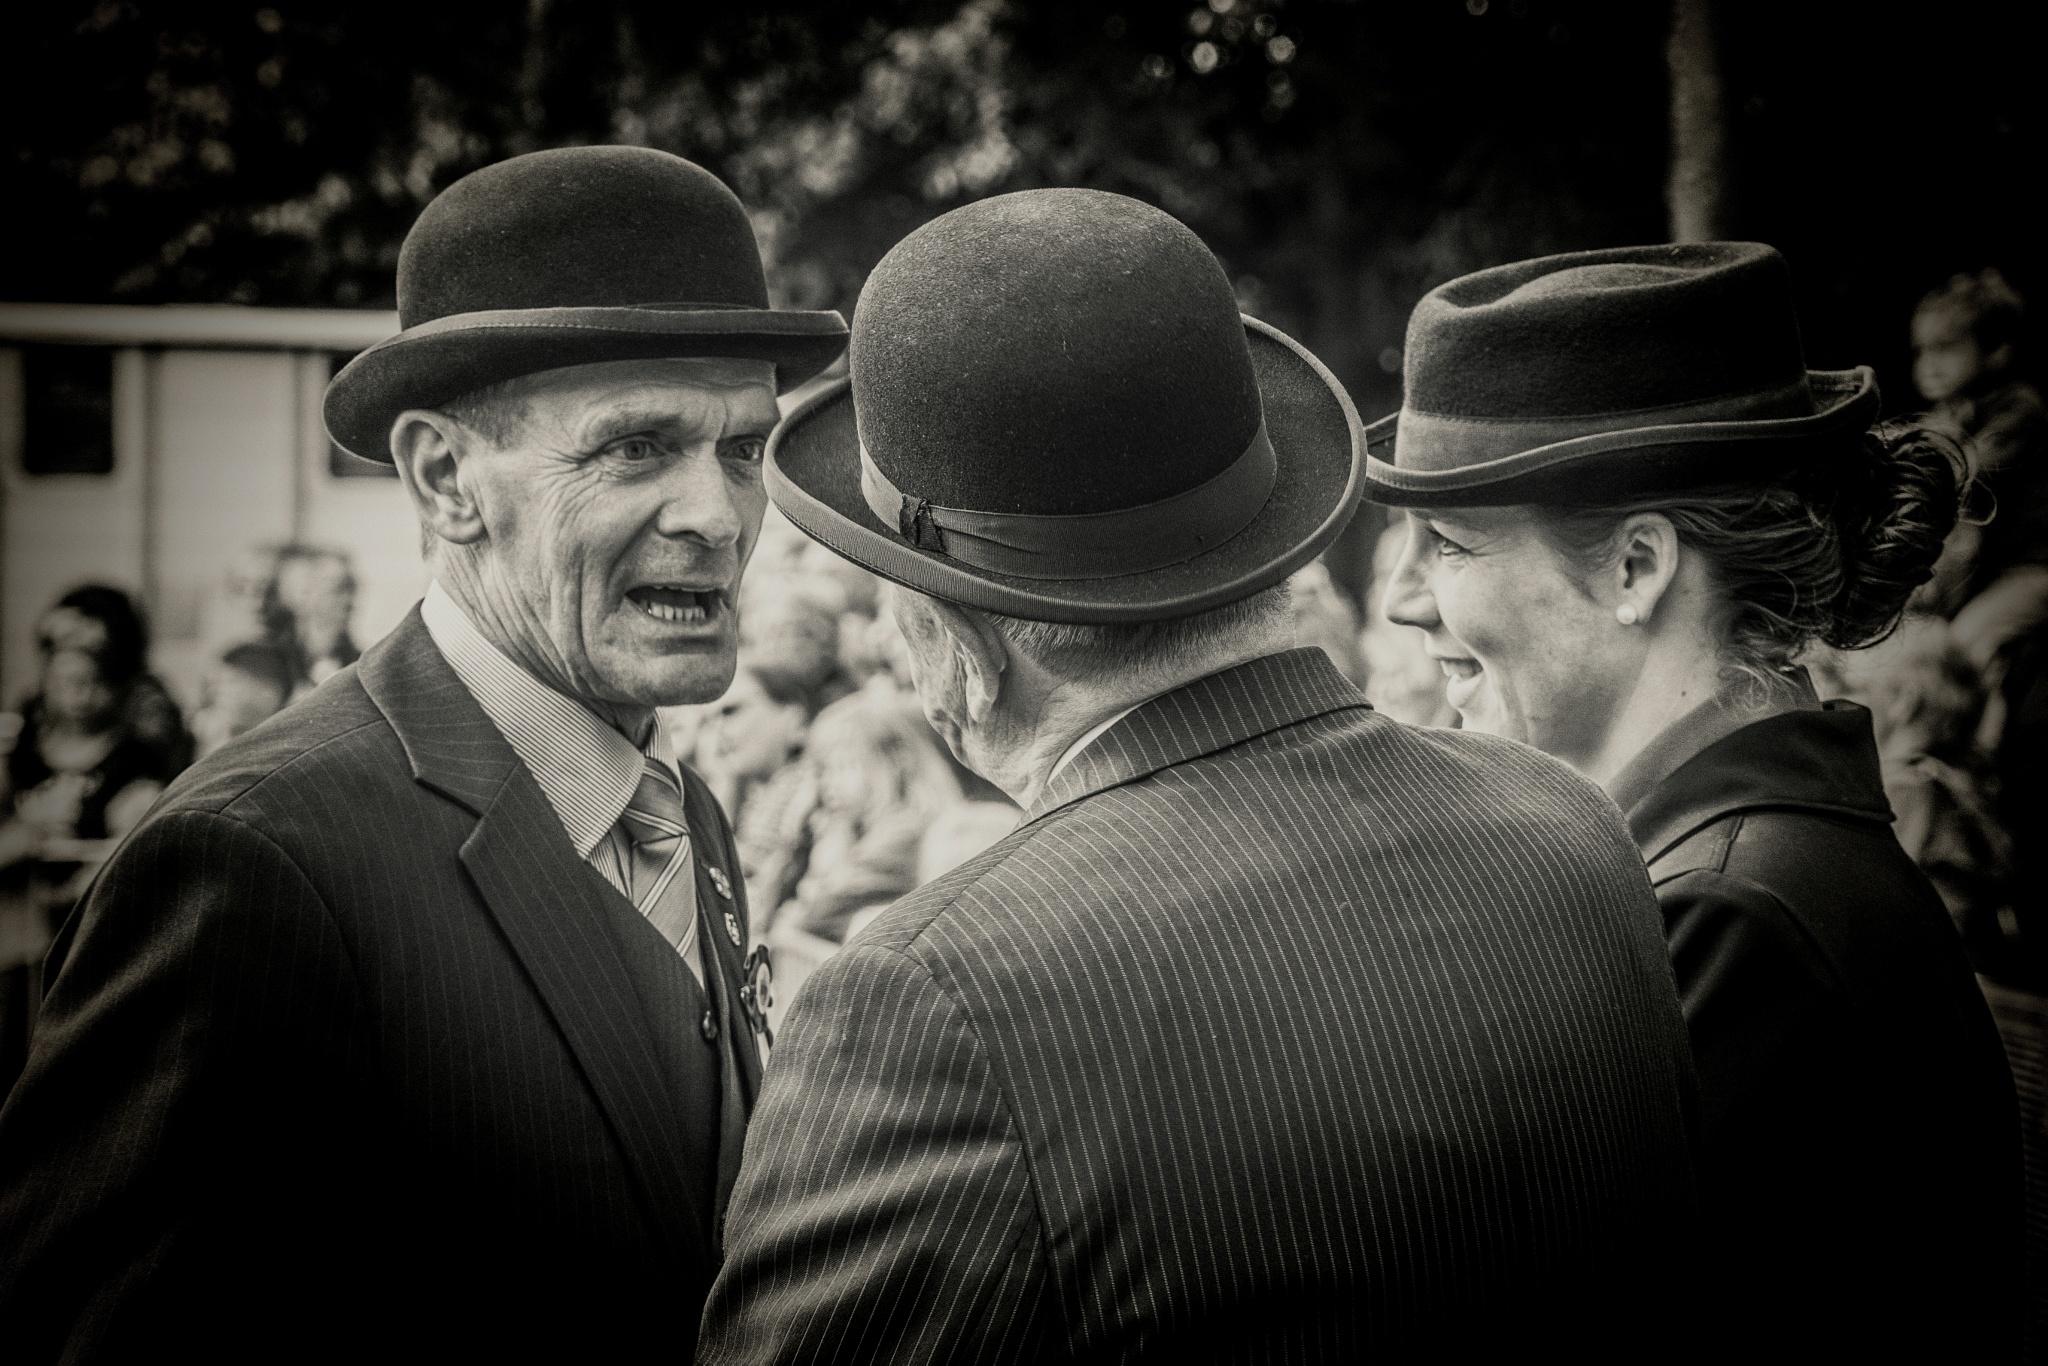 Old friends with hats by Joop Nijhof